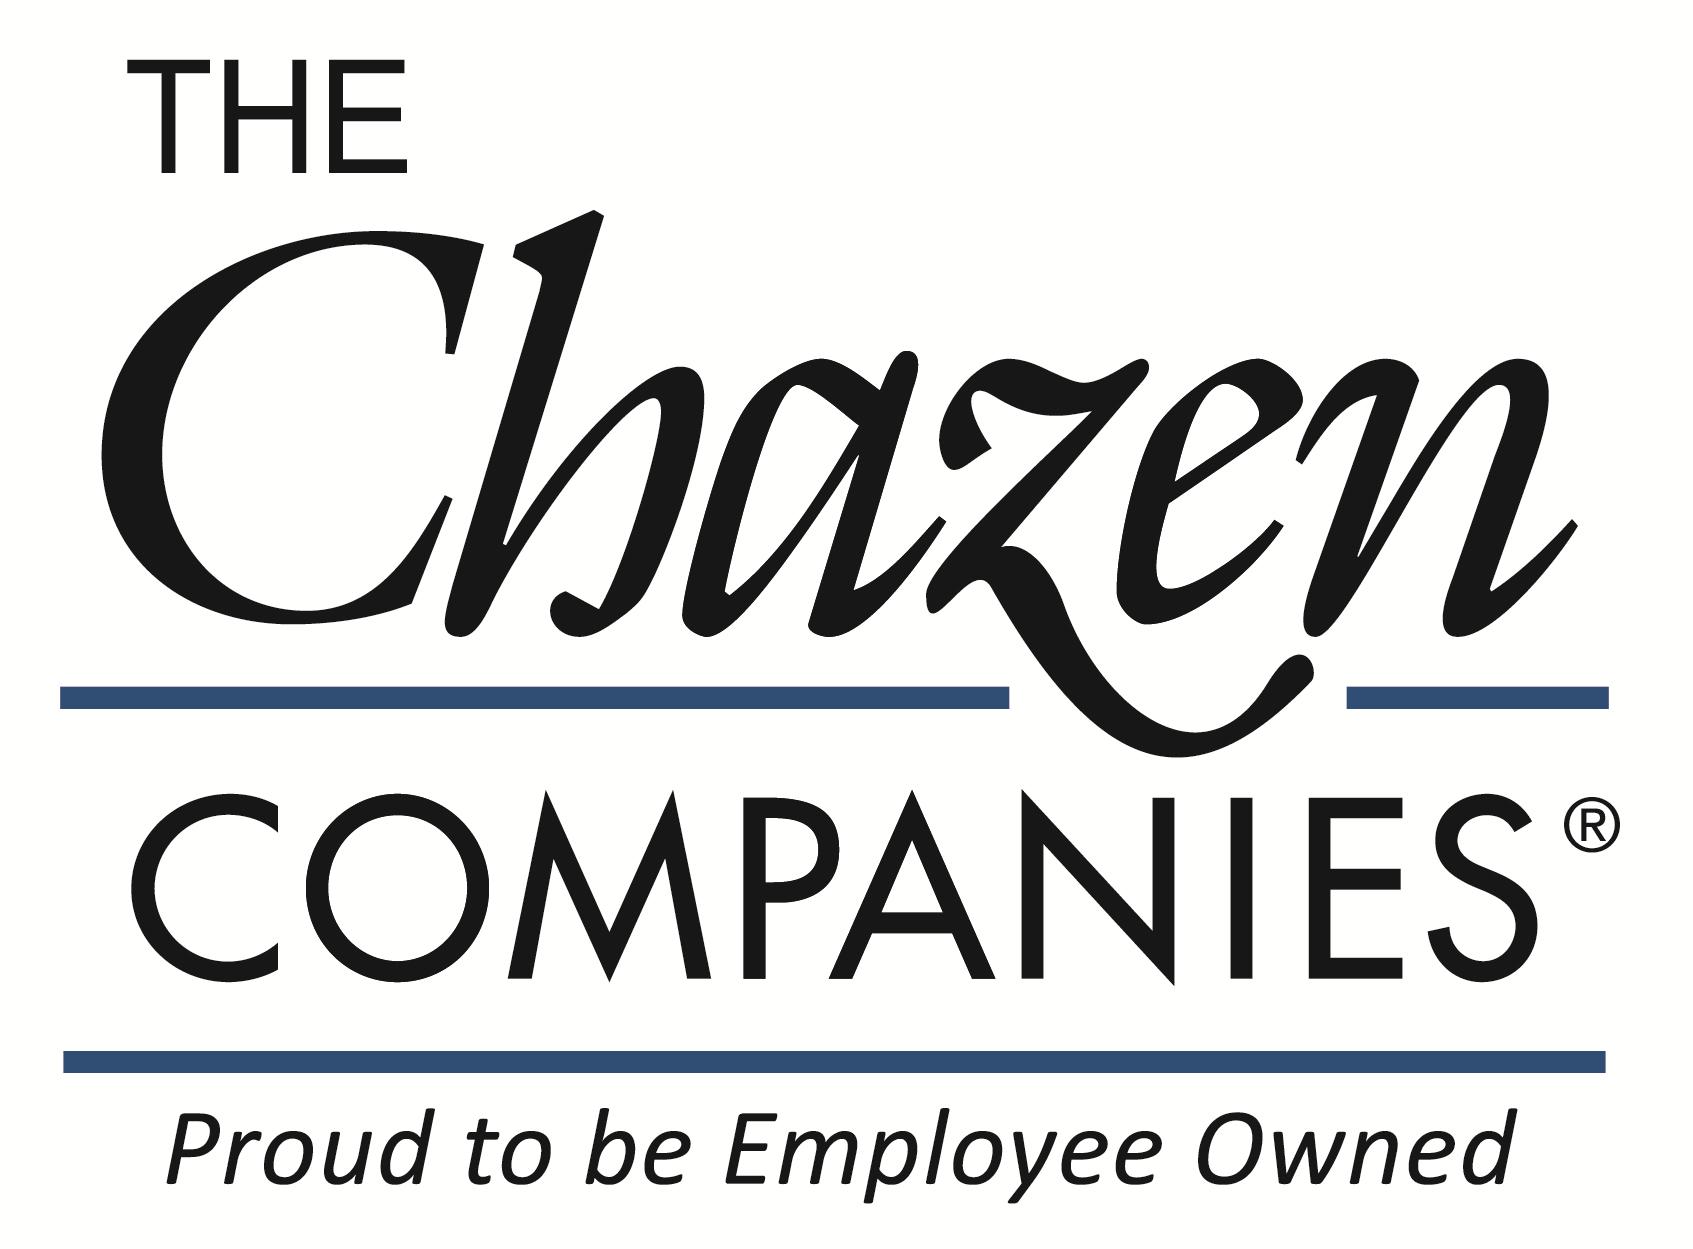 The Chazen Companies logo